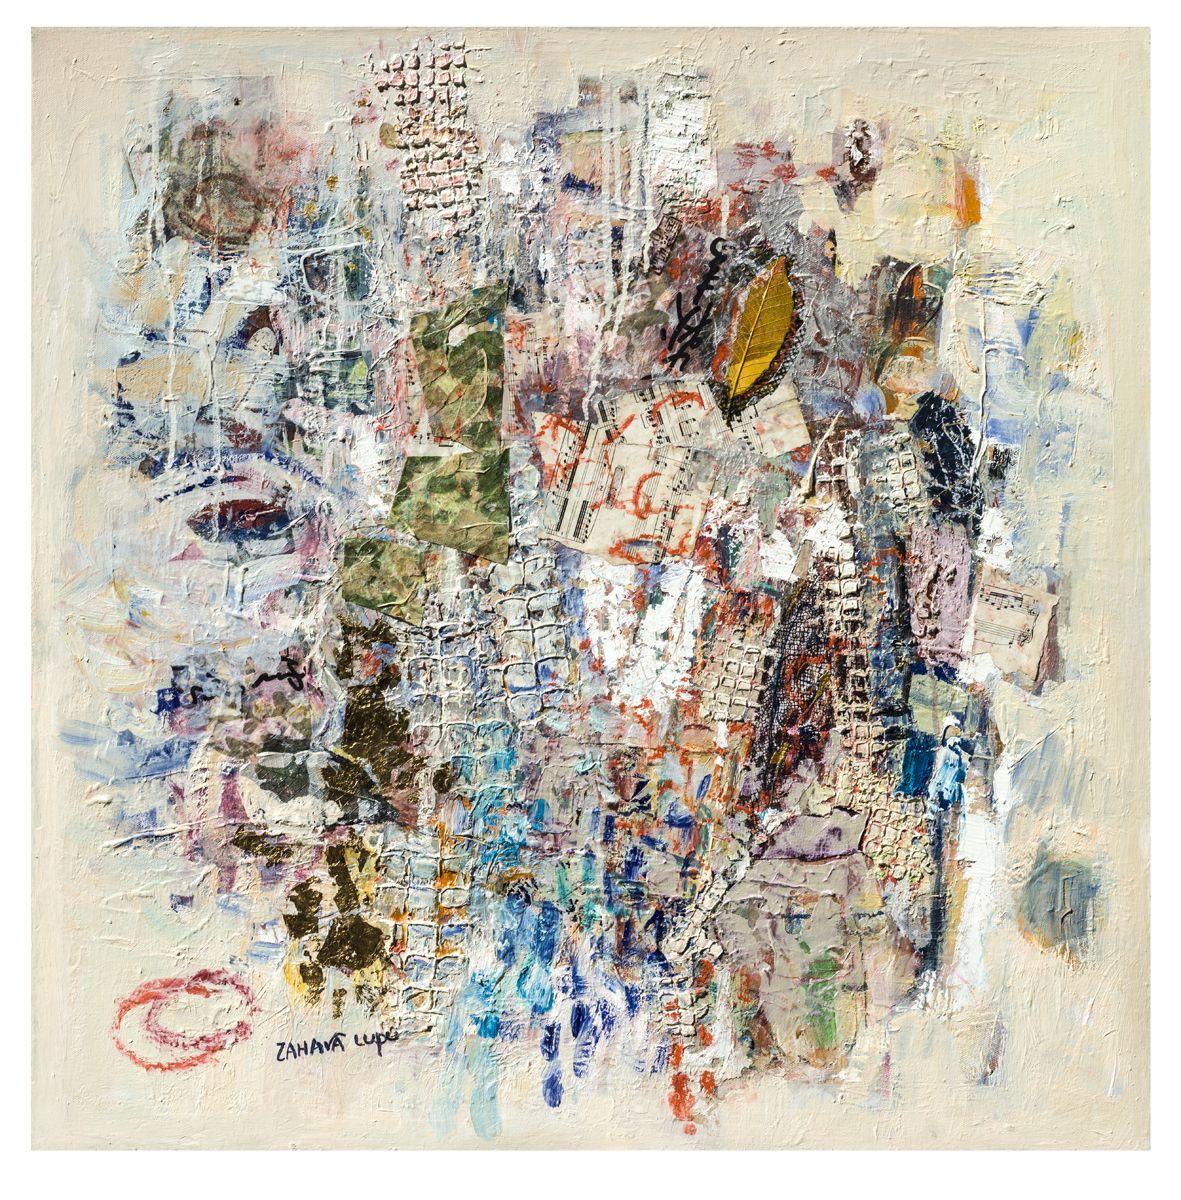 Intimacy abstract art by Zahava lupu